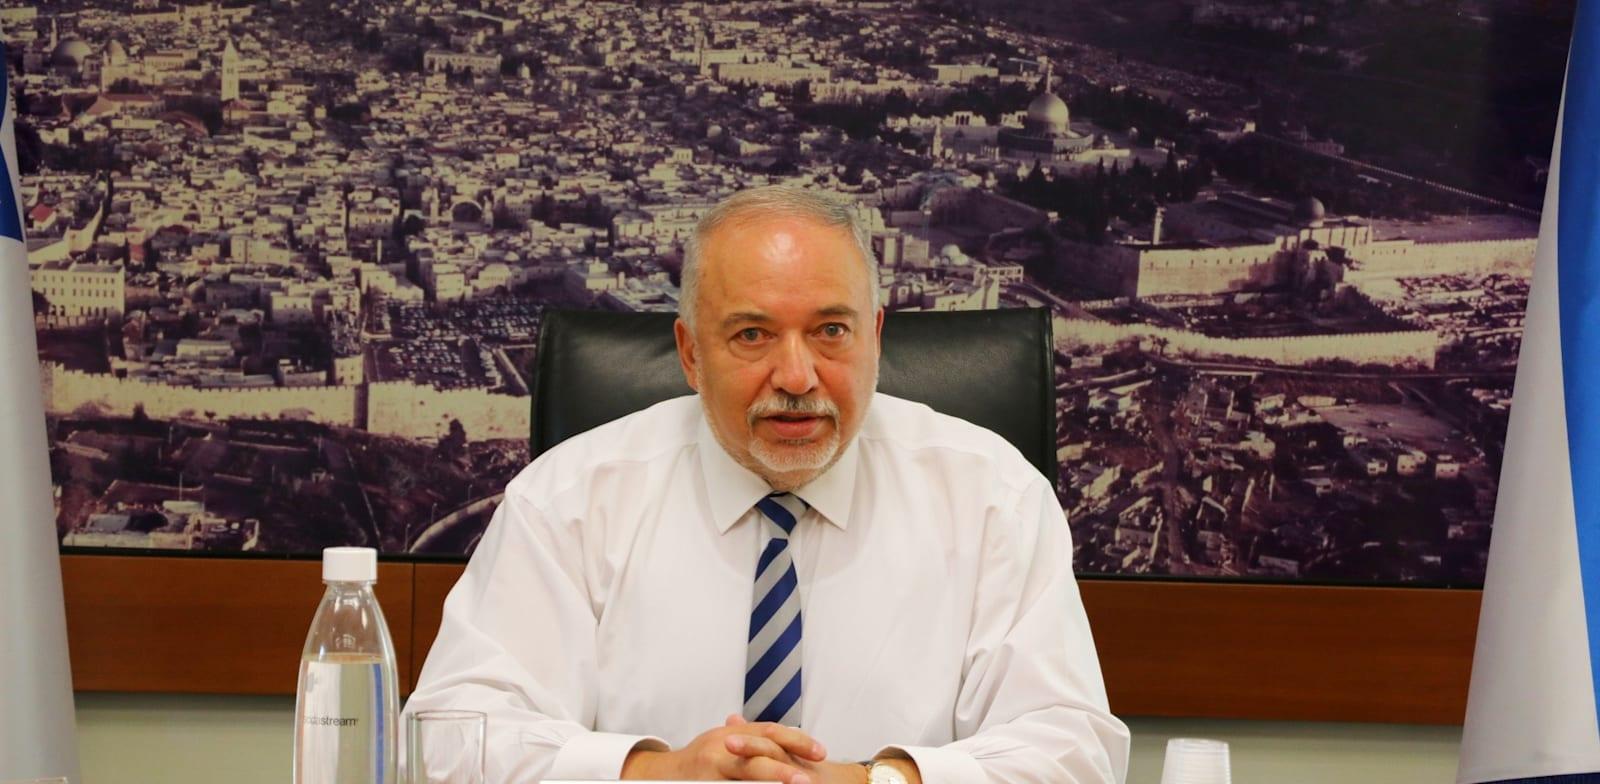 Avigdor Liberman in the Ministry of Finance Photo: Finance Ministry Spokesperson